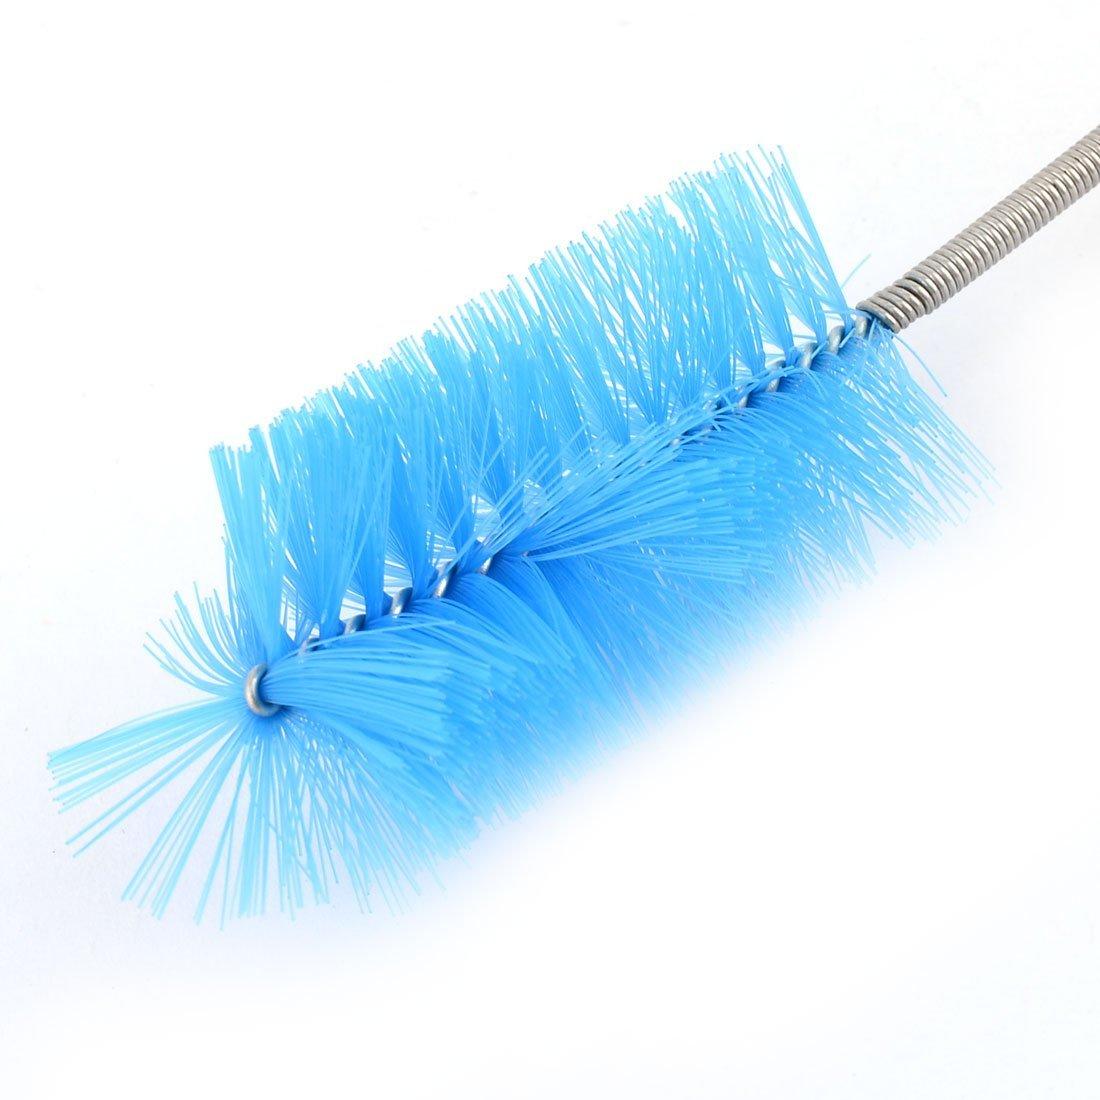 Amazon.com : eDealMax acuario Flexible Spring Air tubo manguera del cepillo de limpieza 66 pulgadas de Cuerpo entero Azul : Pet Supplies